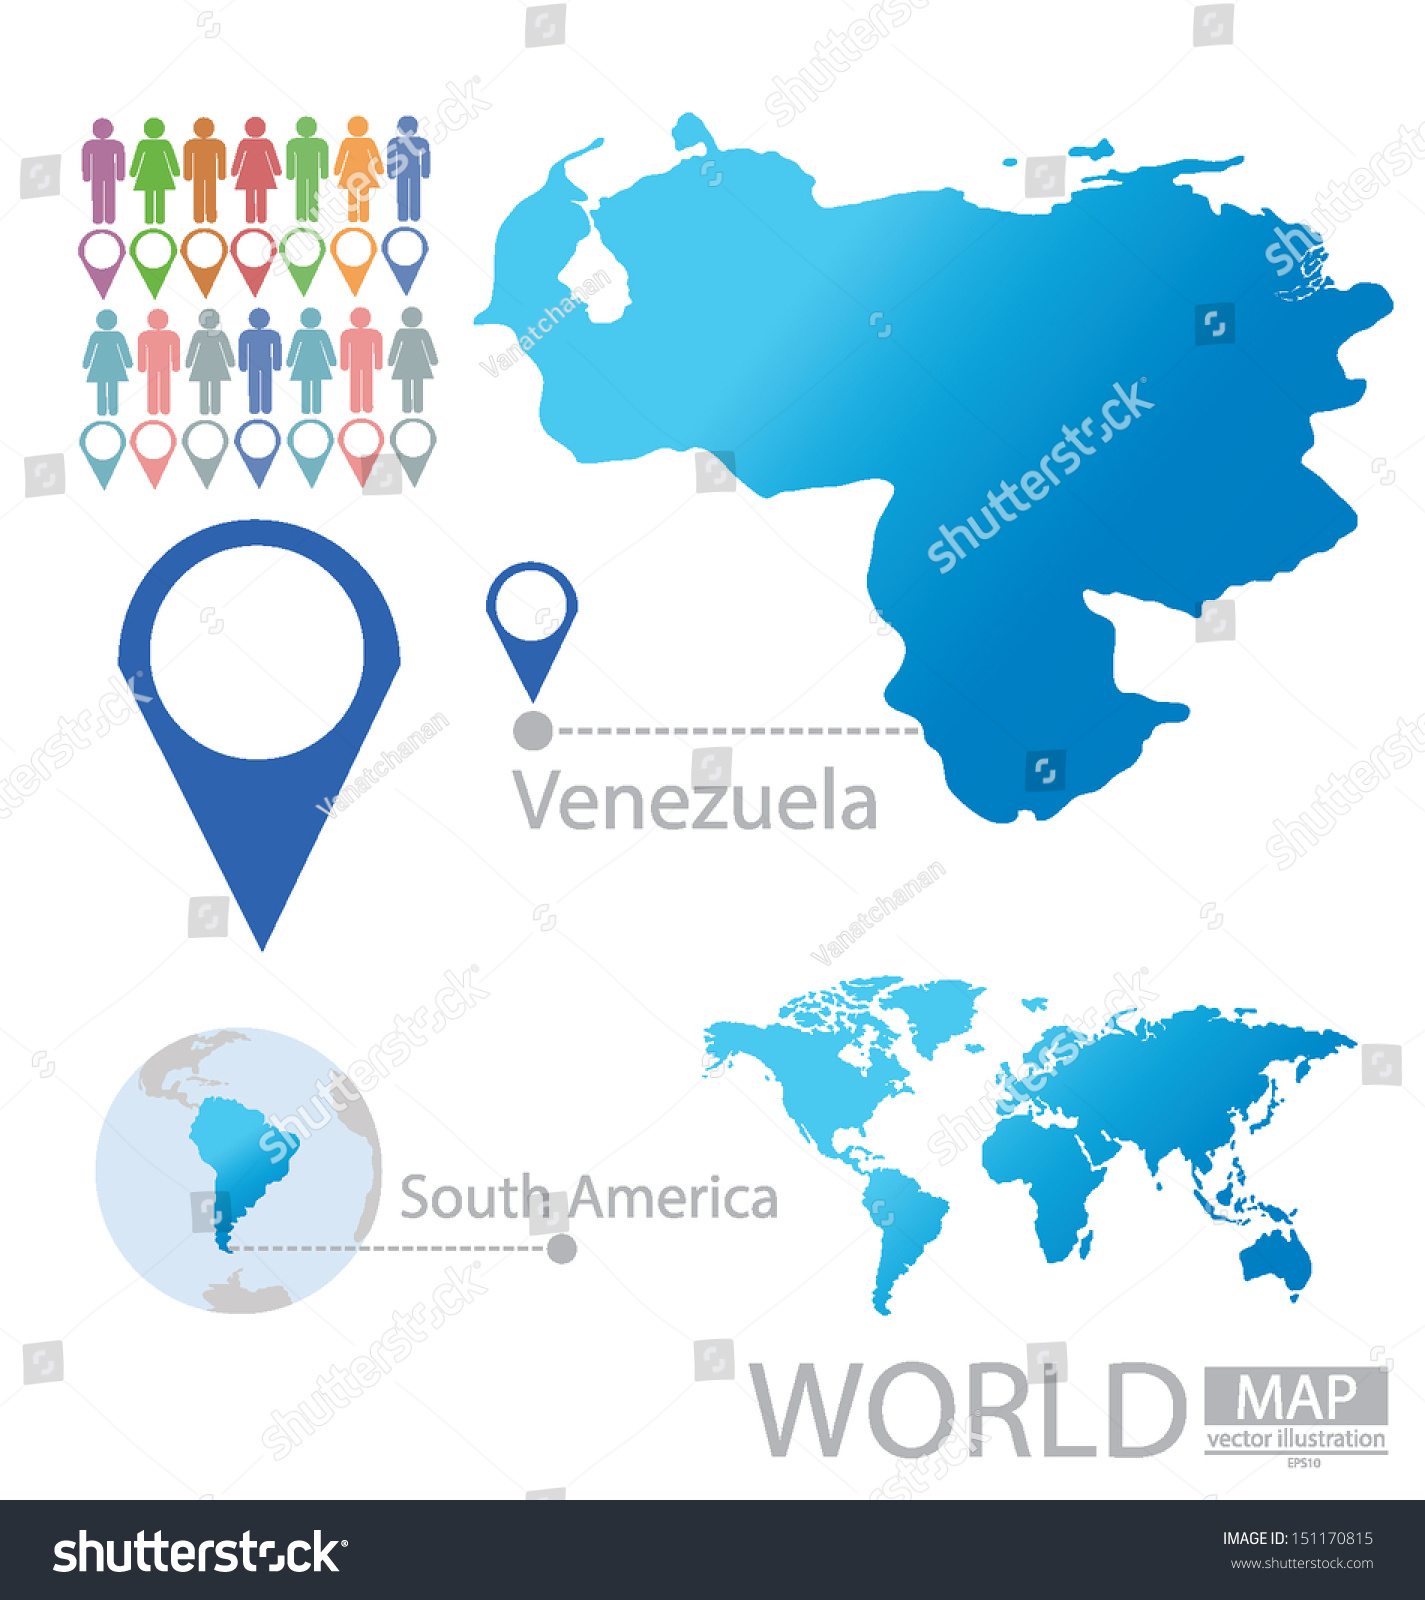 Venezuela South America World Map Vector Stock Vector - Map of venezuela south america